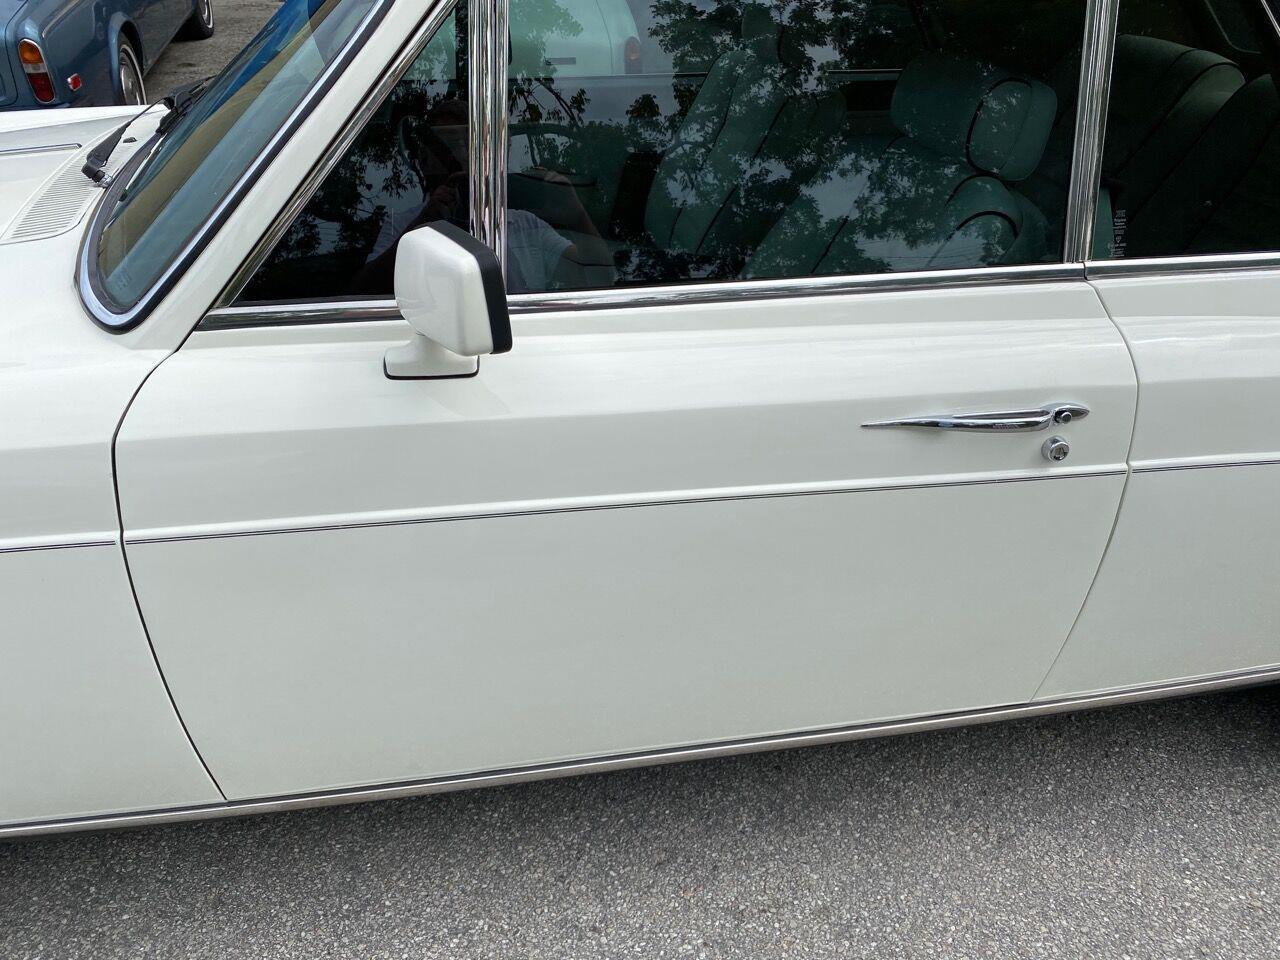 1991 Rolls-Royce Corniche (CC-1353007) for sale in Fort Lauderdale, Florida